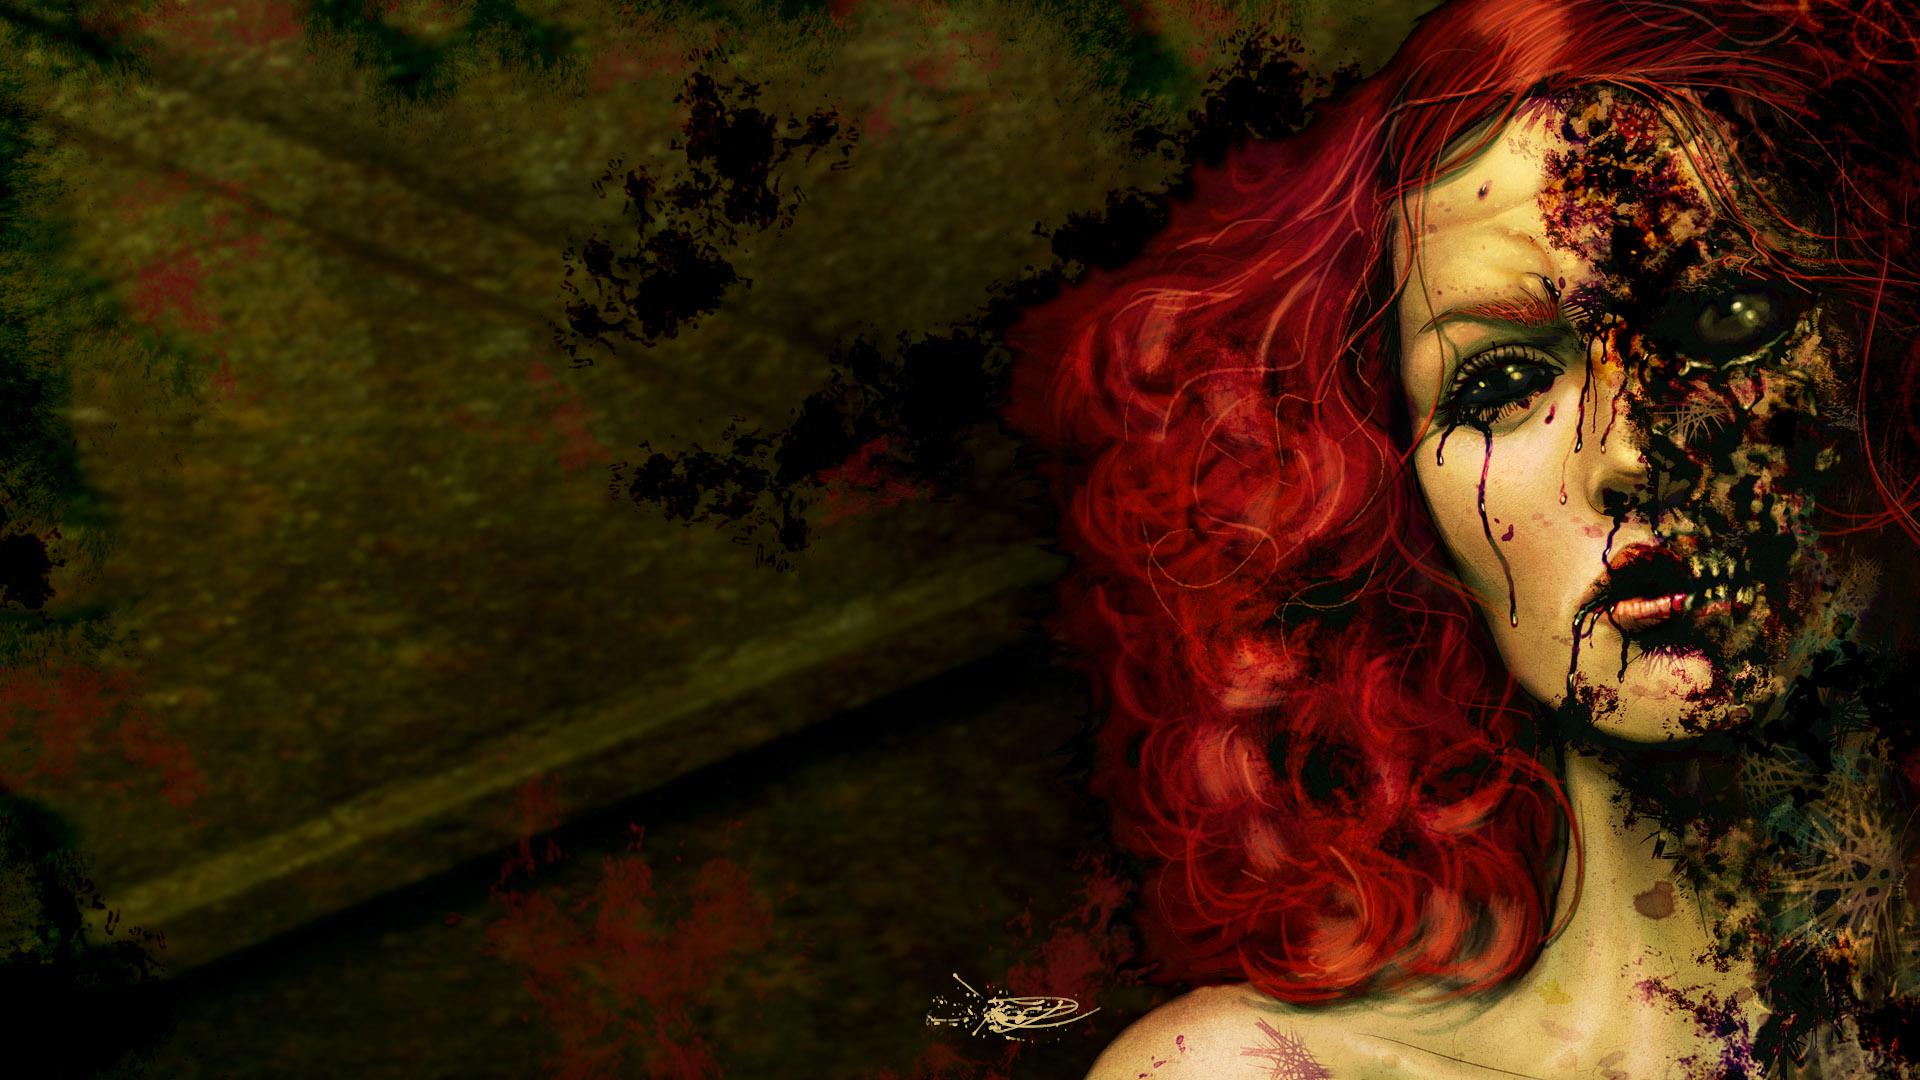 Dark art horror gothic decay ruin face eyes demon gore macabre women